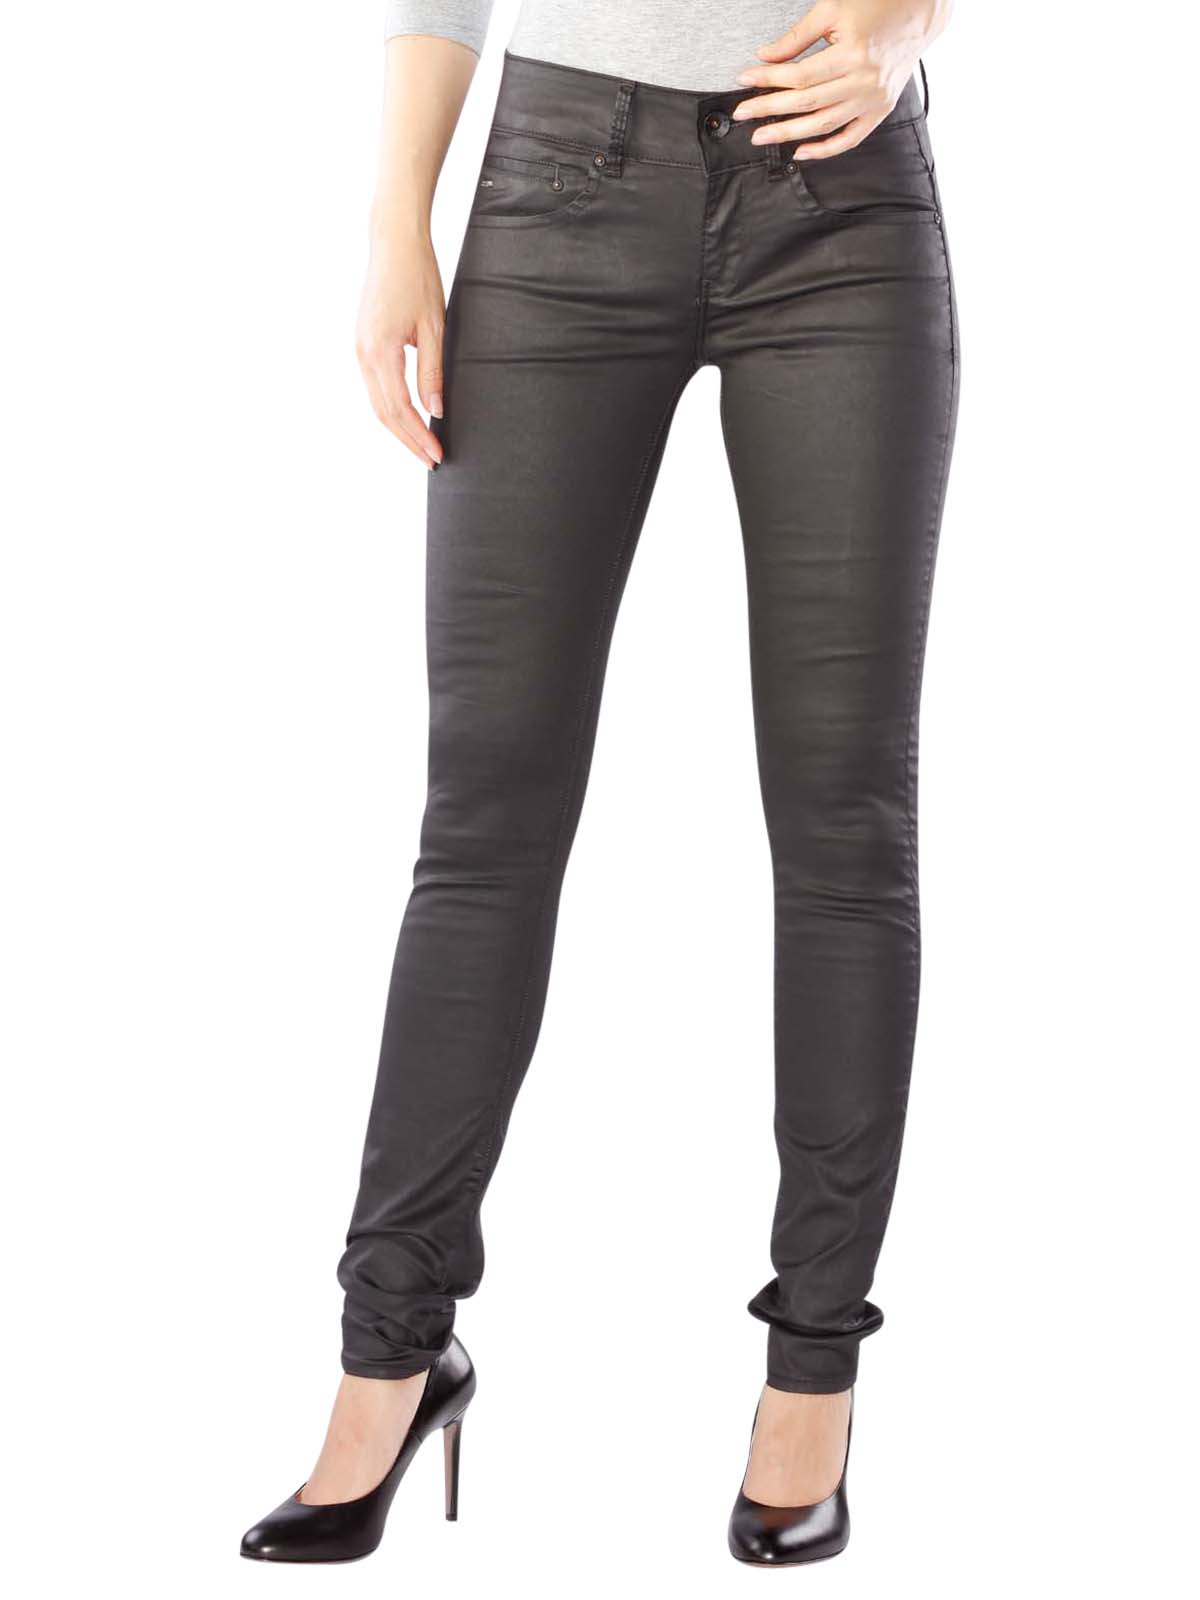 G Star Midge Cody Mid Skinny Jeans rinsed G Star Damen Jeans